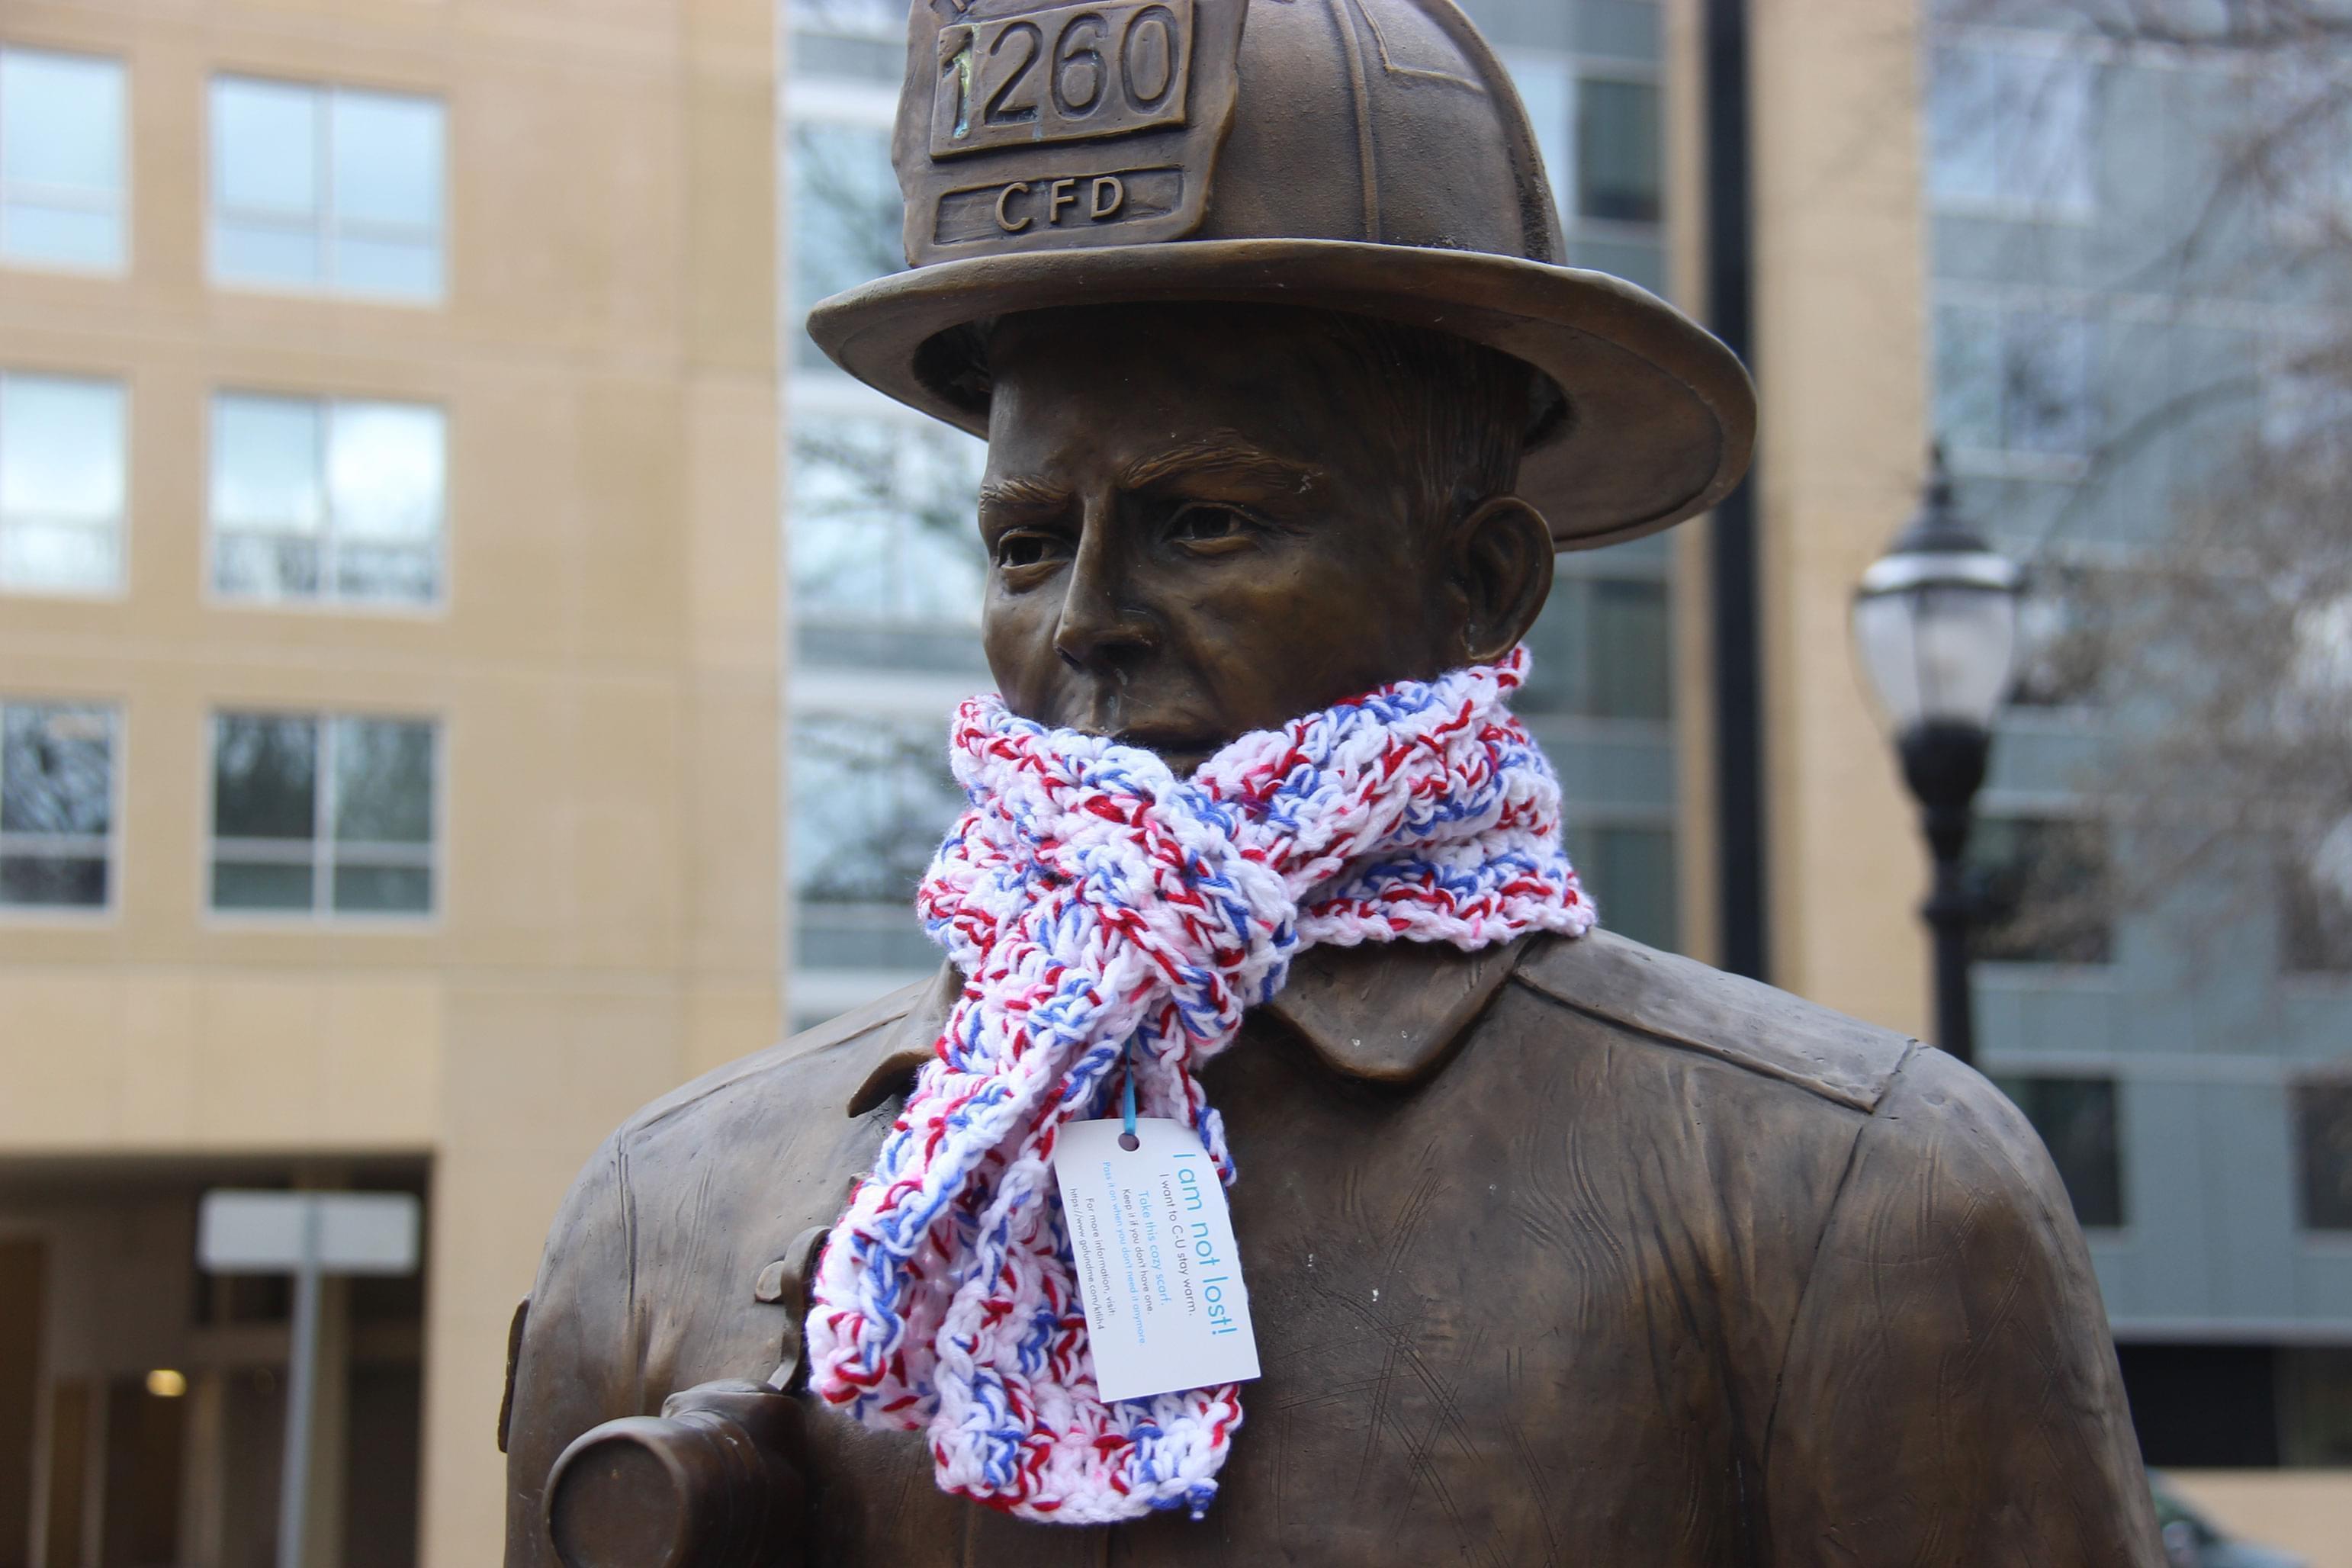 Fireman statue in West Side Park wearing one of Gretchen's scarves